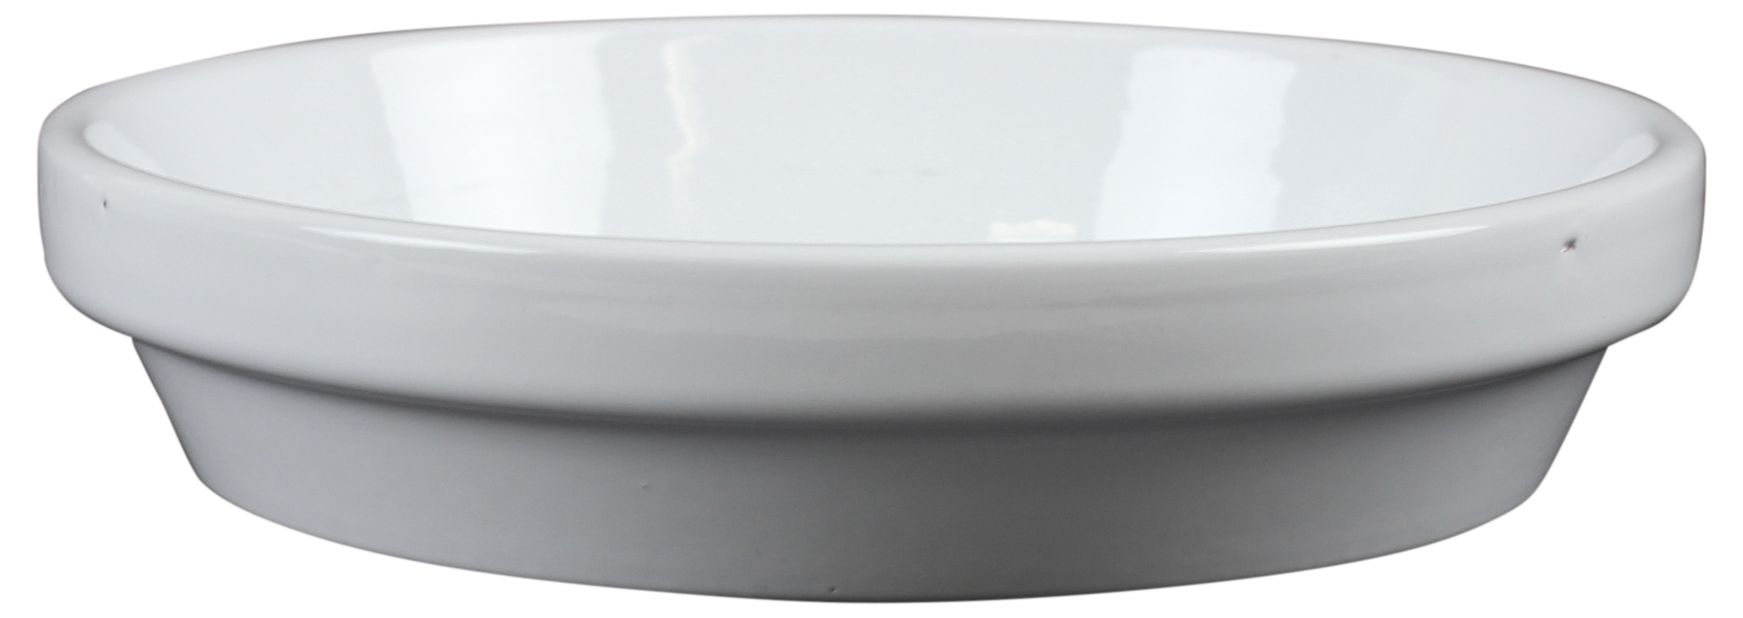 Aluslautanen  , Ø18 cm, Valkoinen